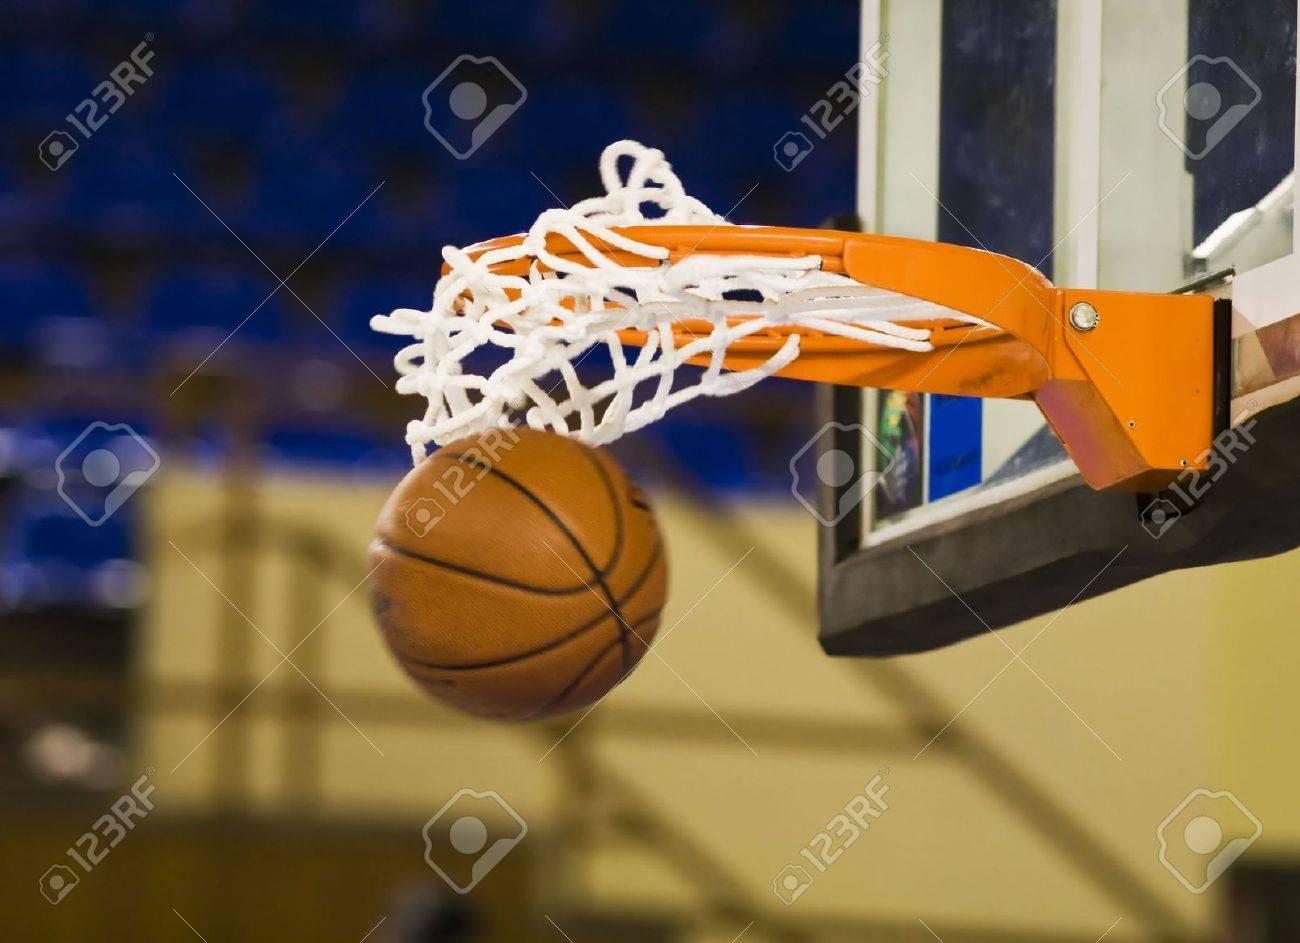 Ball in hoop - 3637884